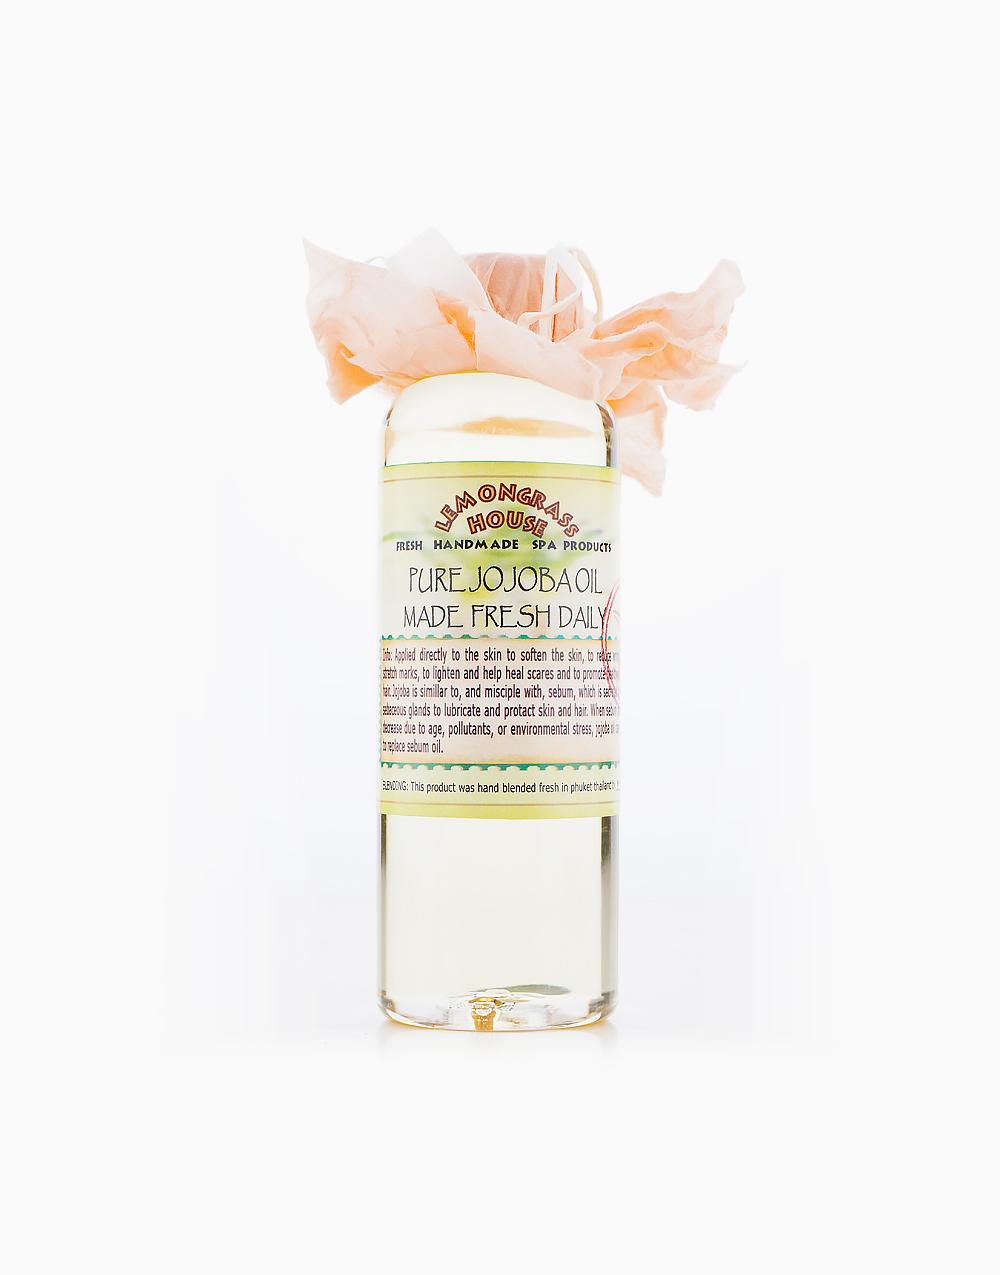 Pure Jojoba Oil (250ml) by Lemongrass House